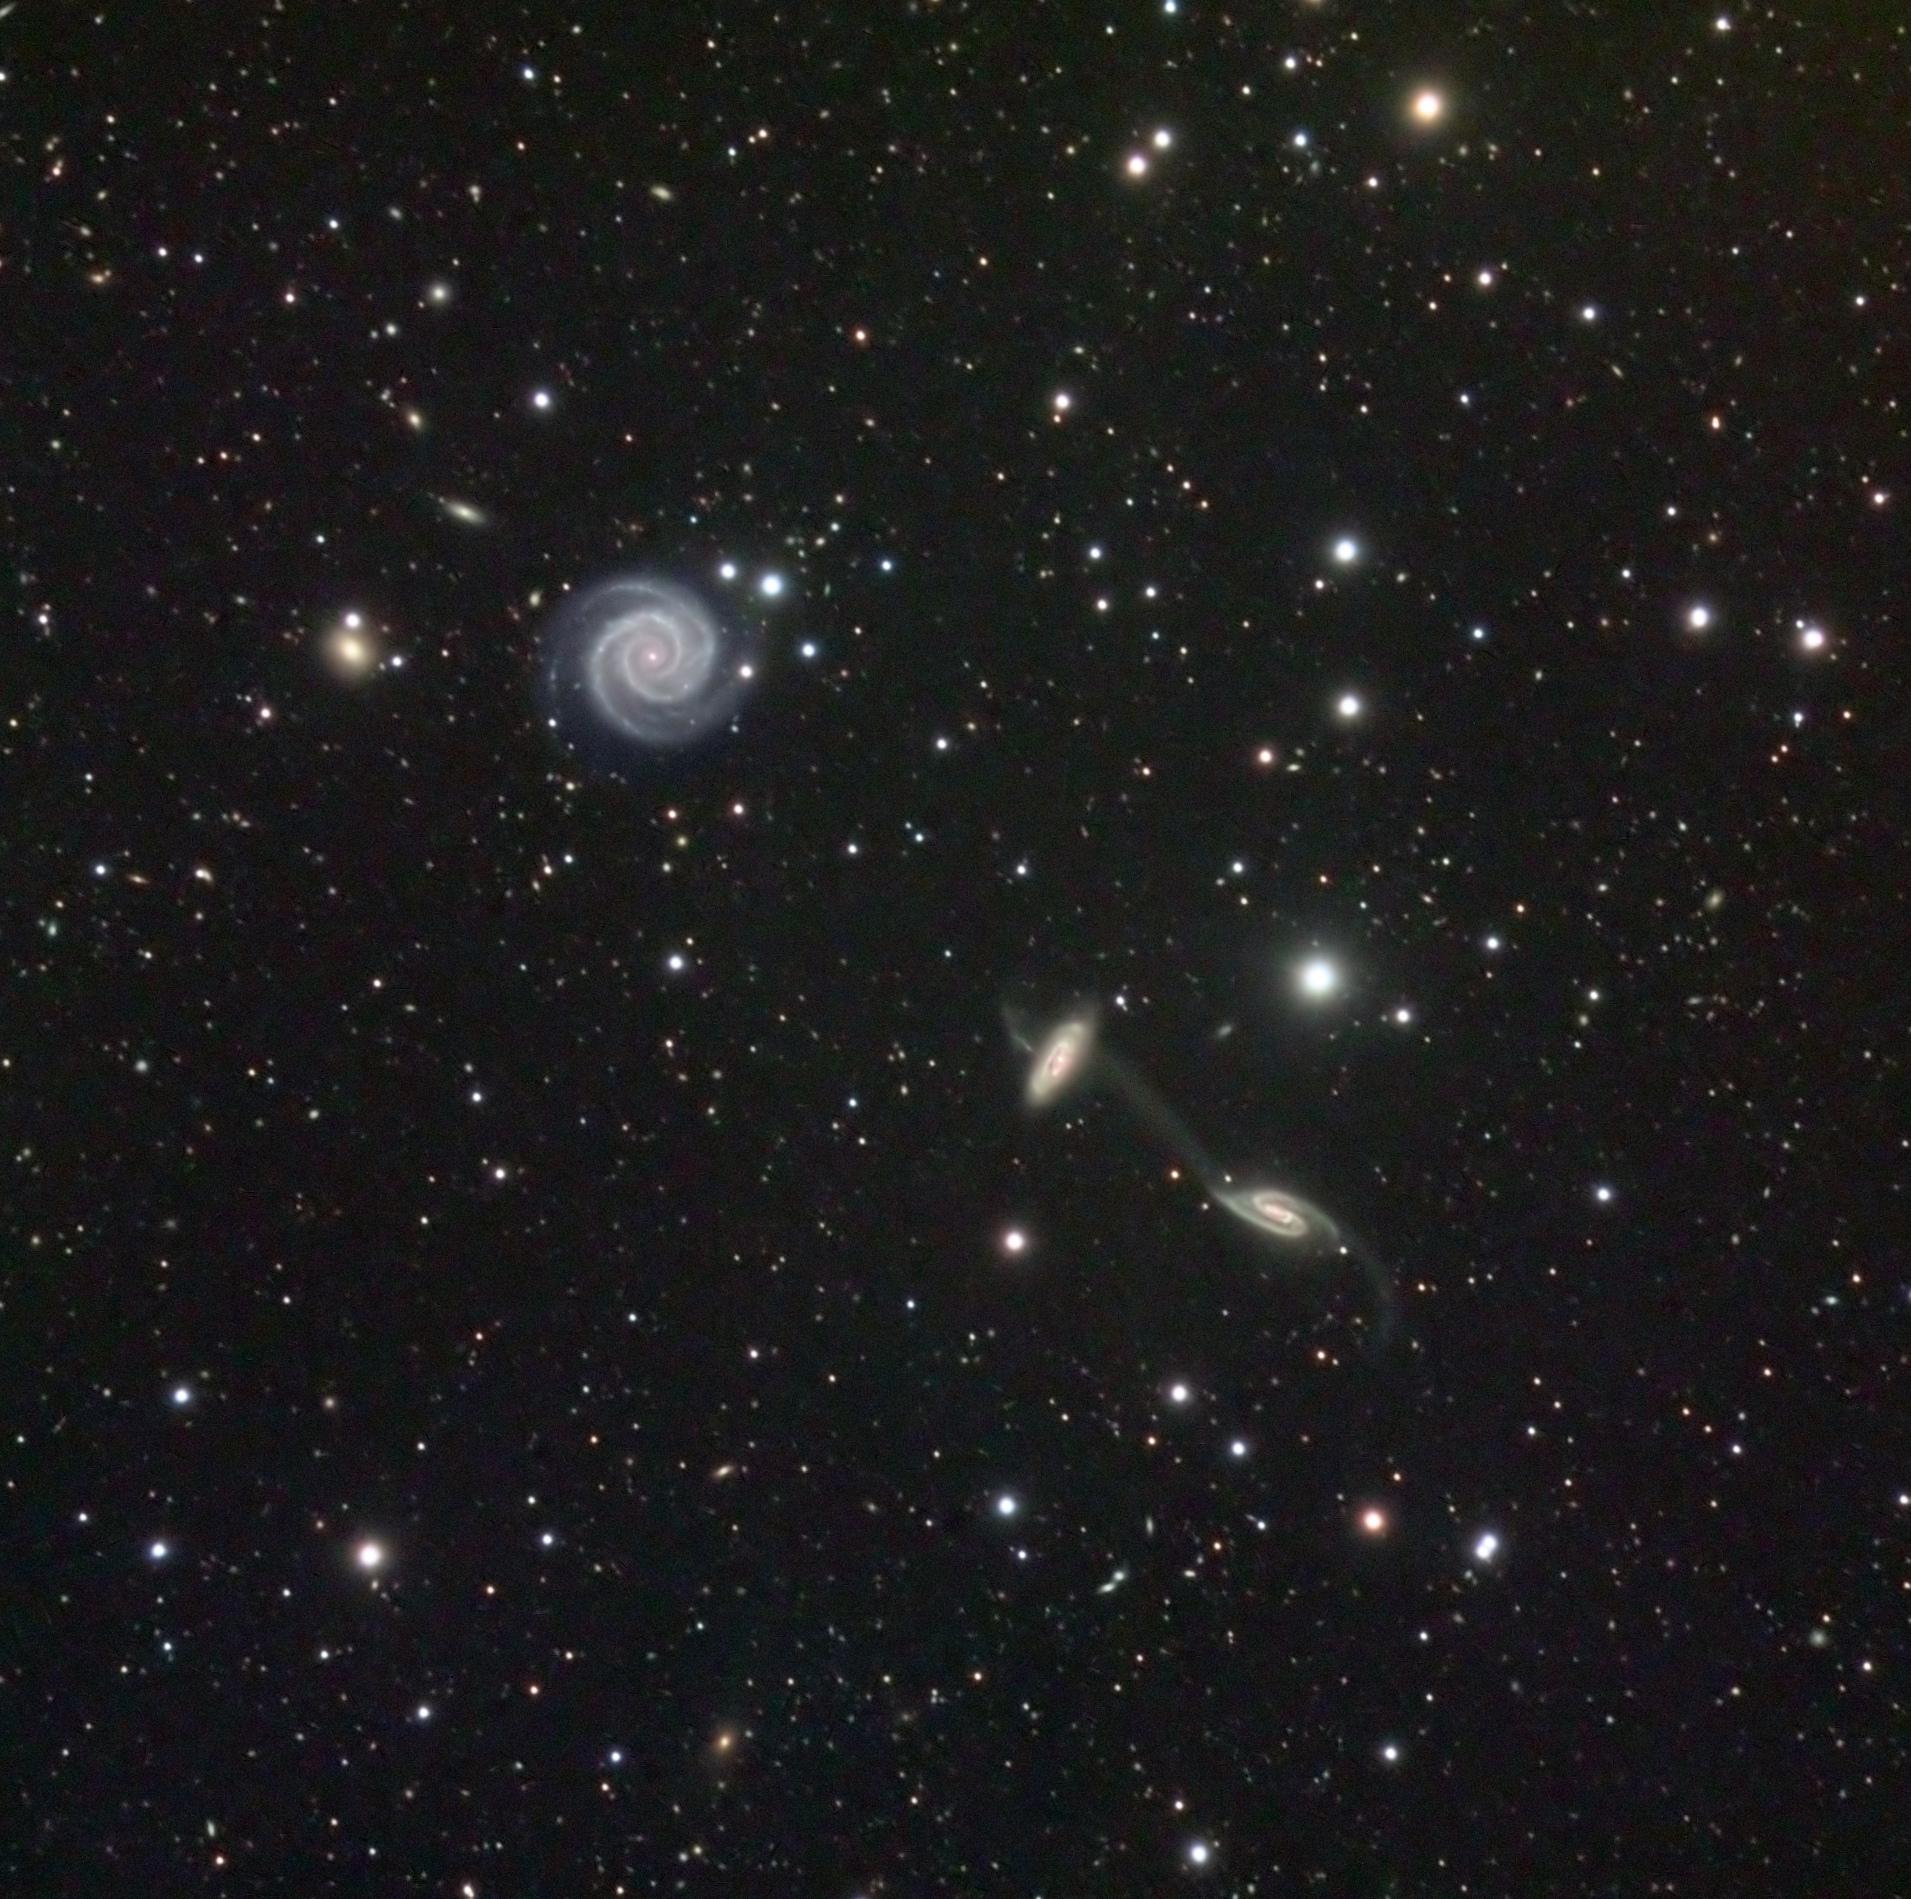 NGC2856.jpg.037afbbdf9c2b0fb7c2c59045aafaabe.jpg